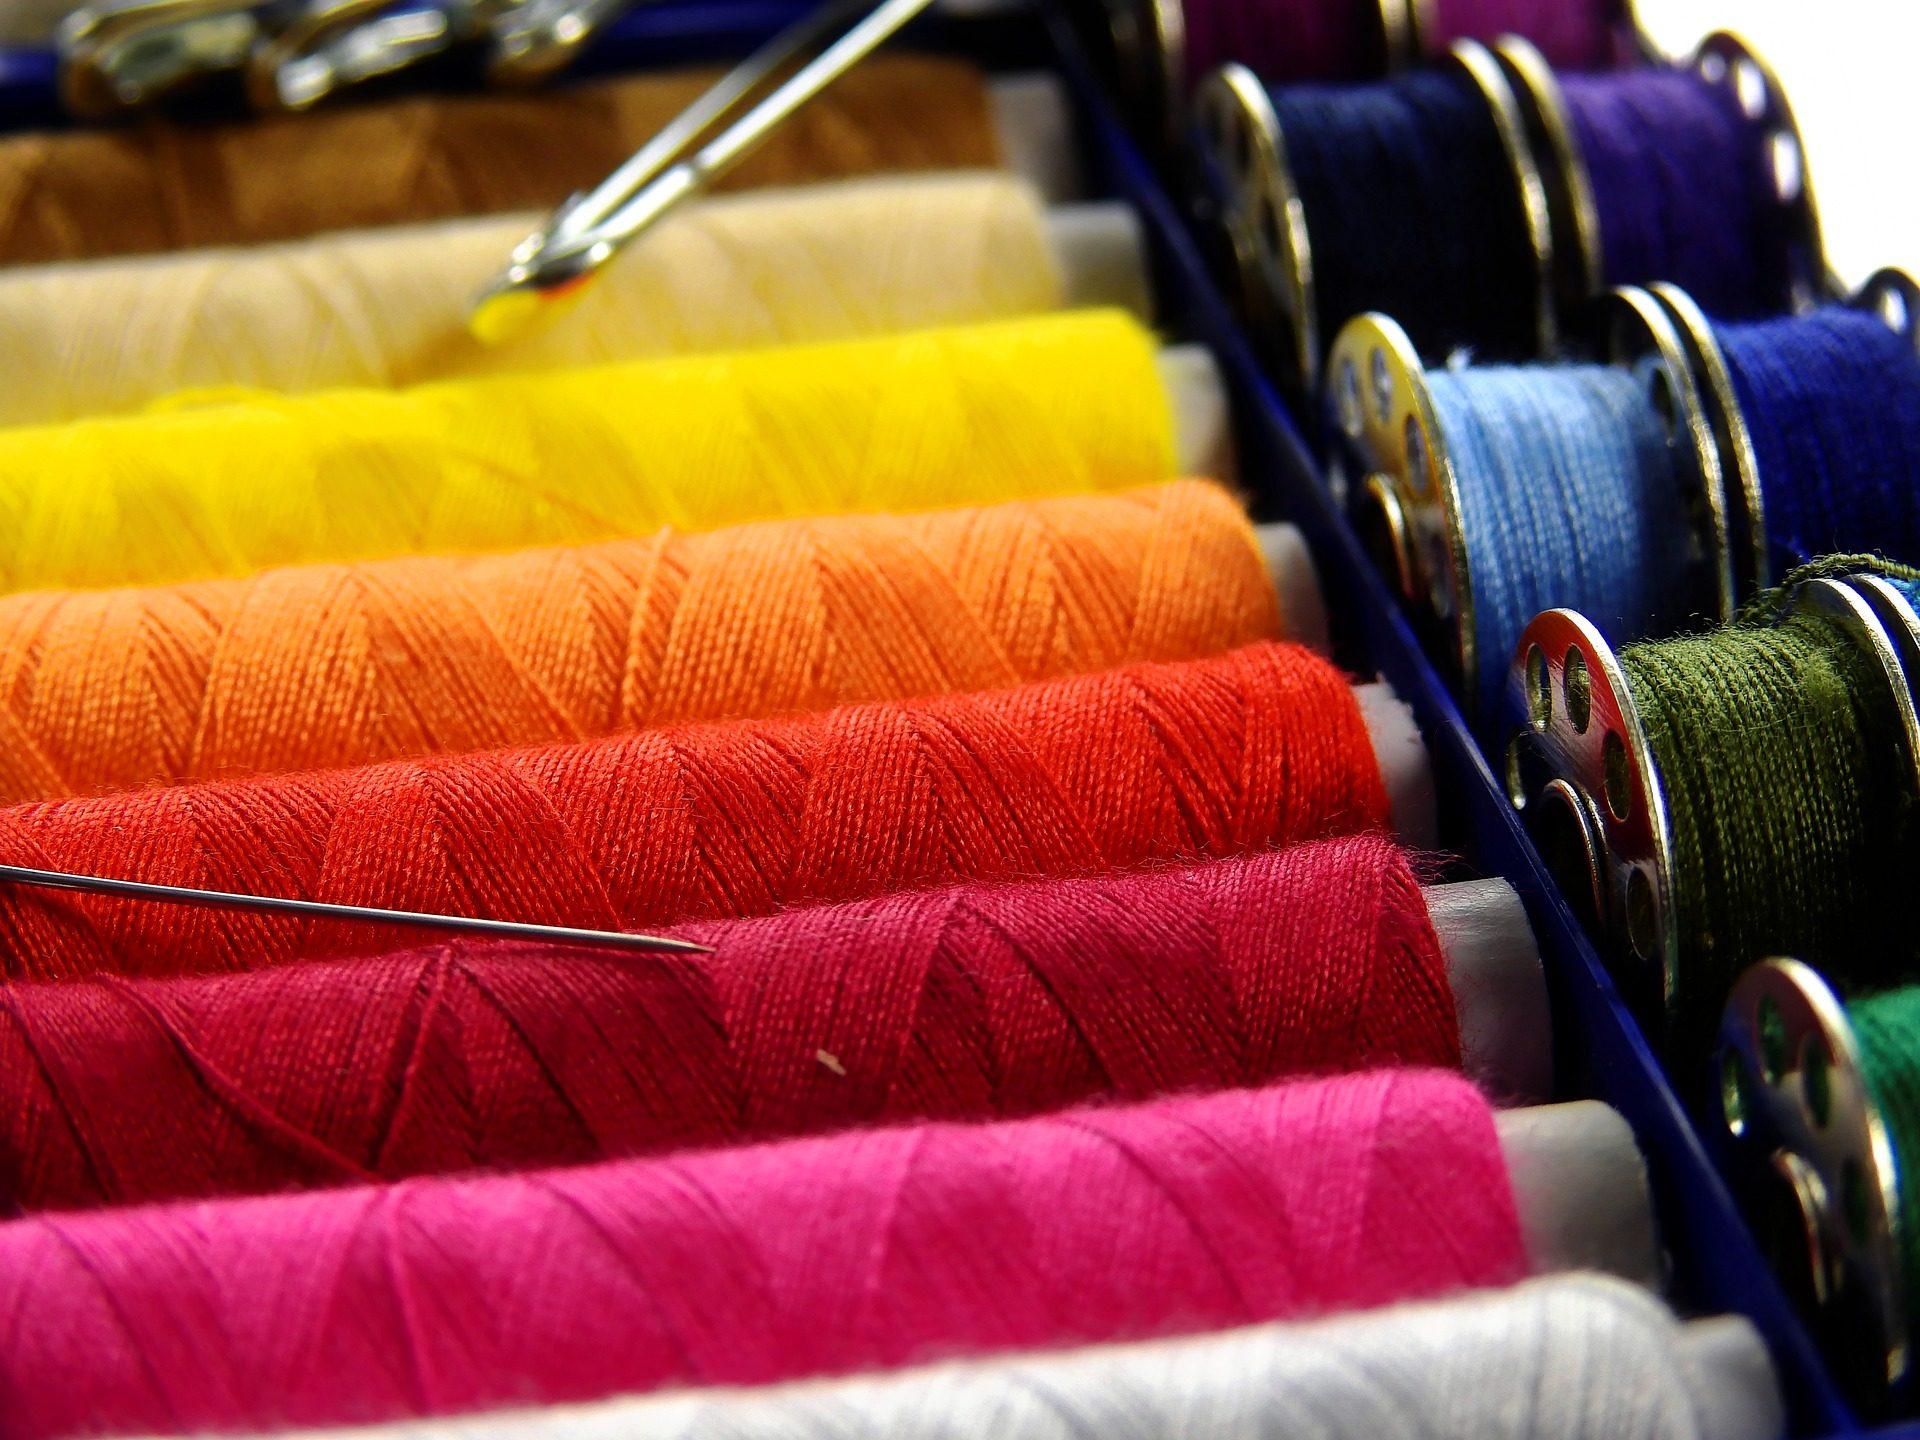 hilos, colores, agujas, canillas, costura, coser - Fondos de Pantalla HD - professor-falken.com